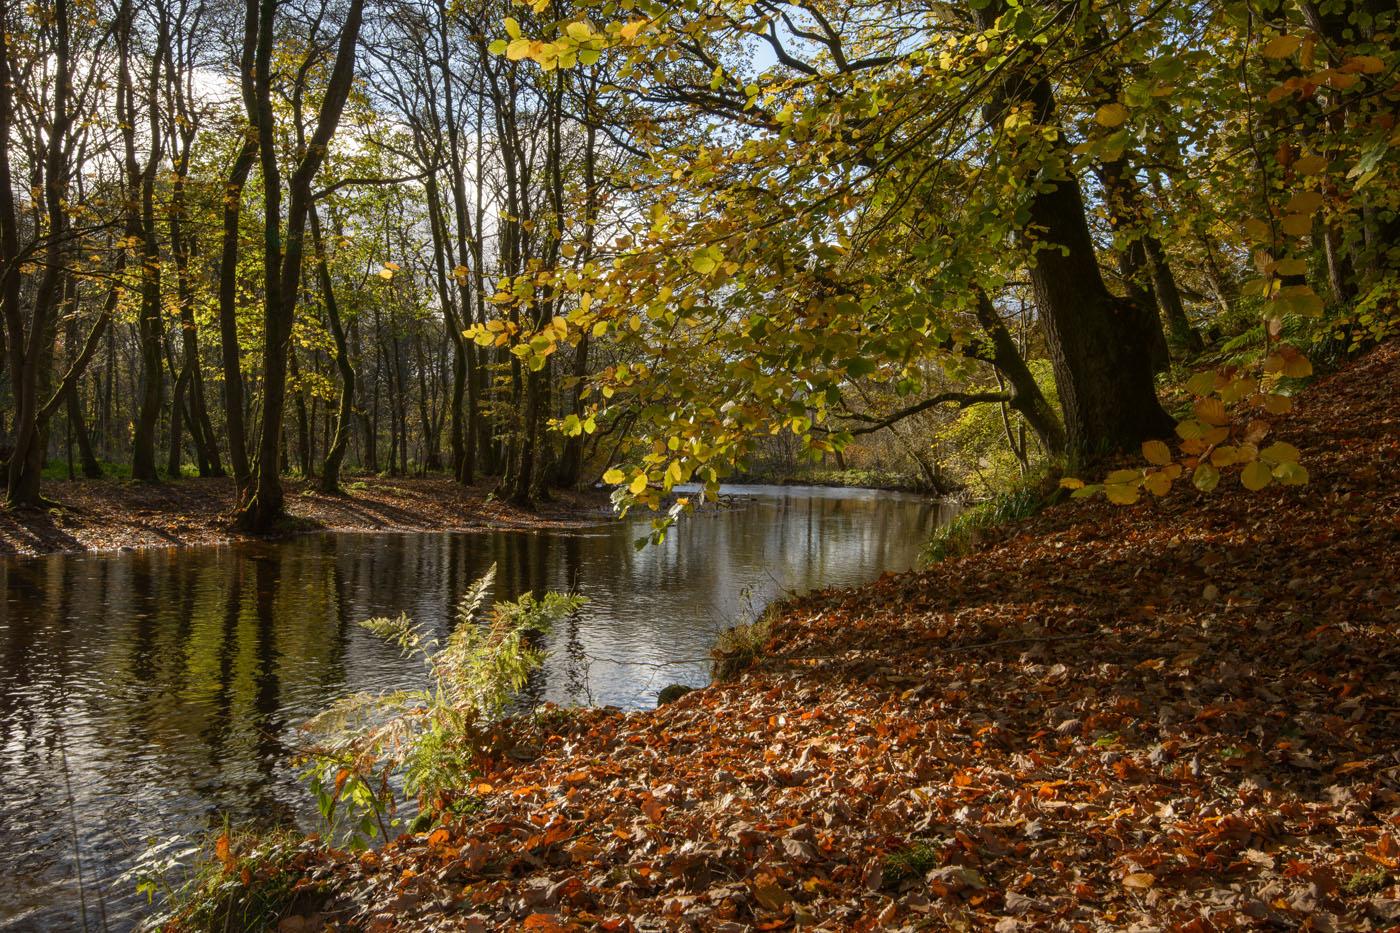 Autumn at the Turret